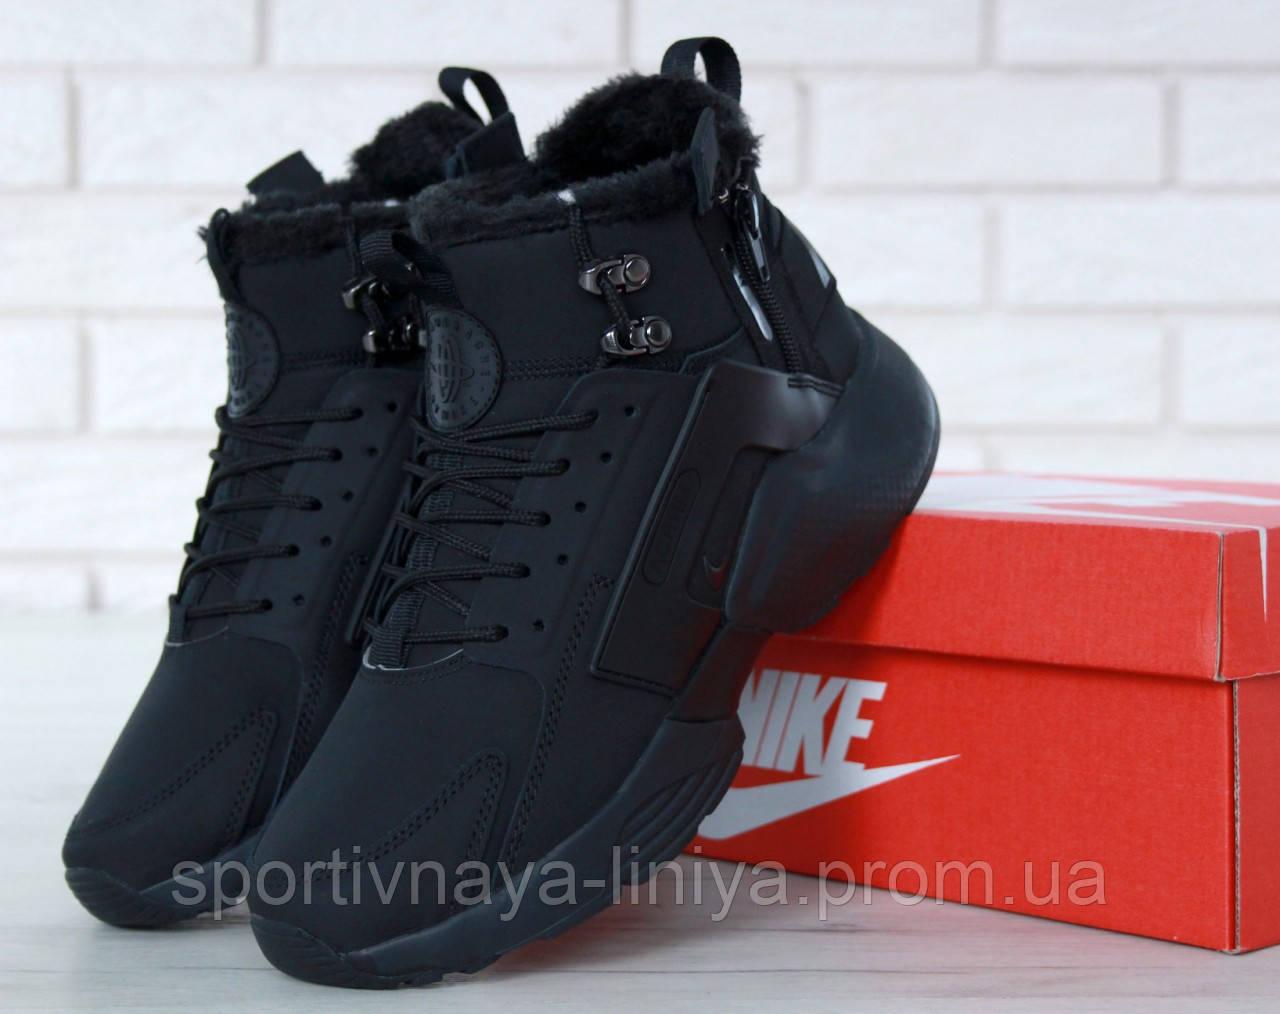 Кроссовки мужские на меху Nike huarache Black Реплика